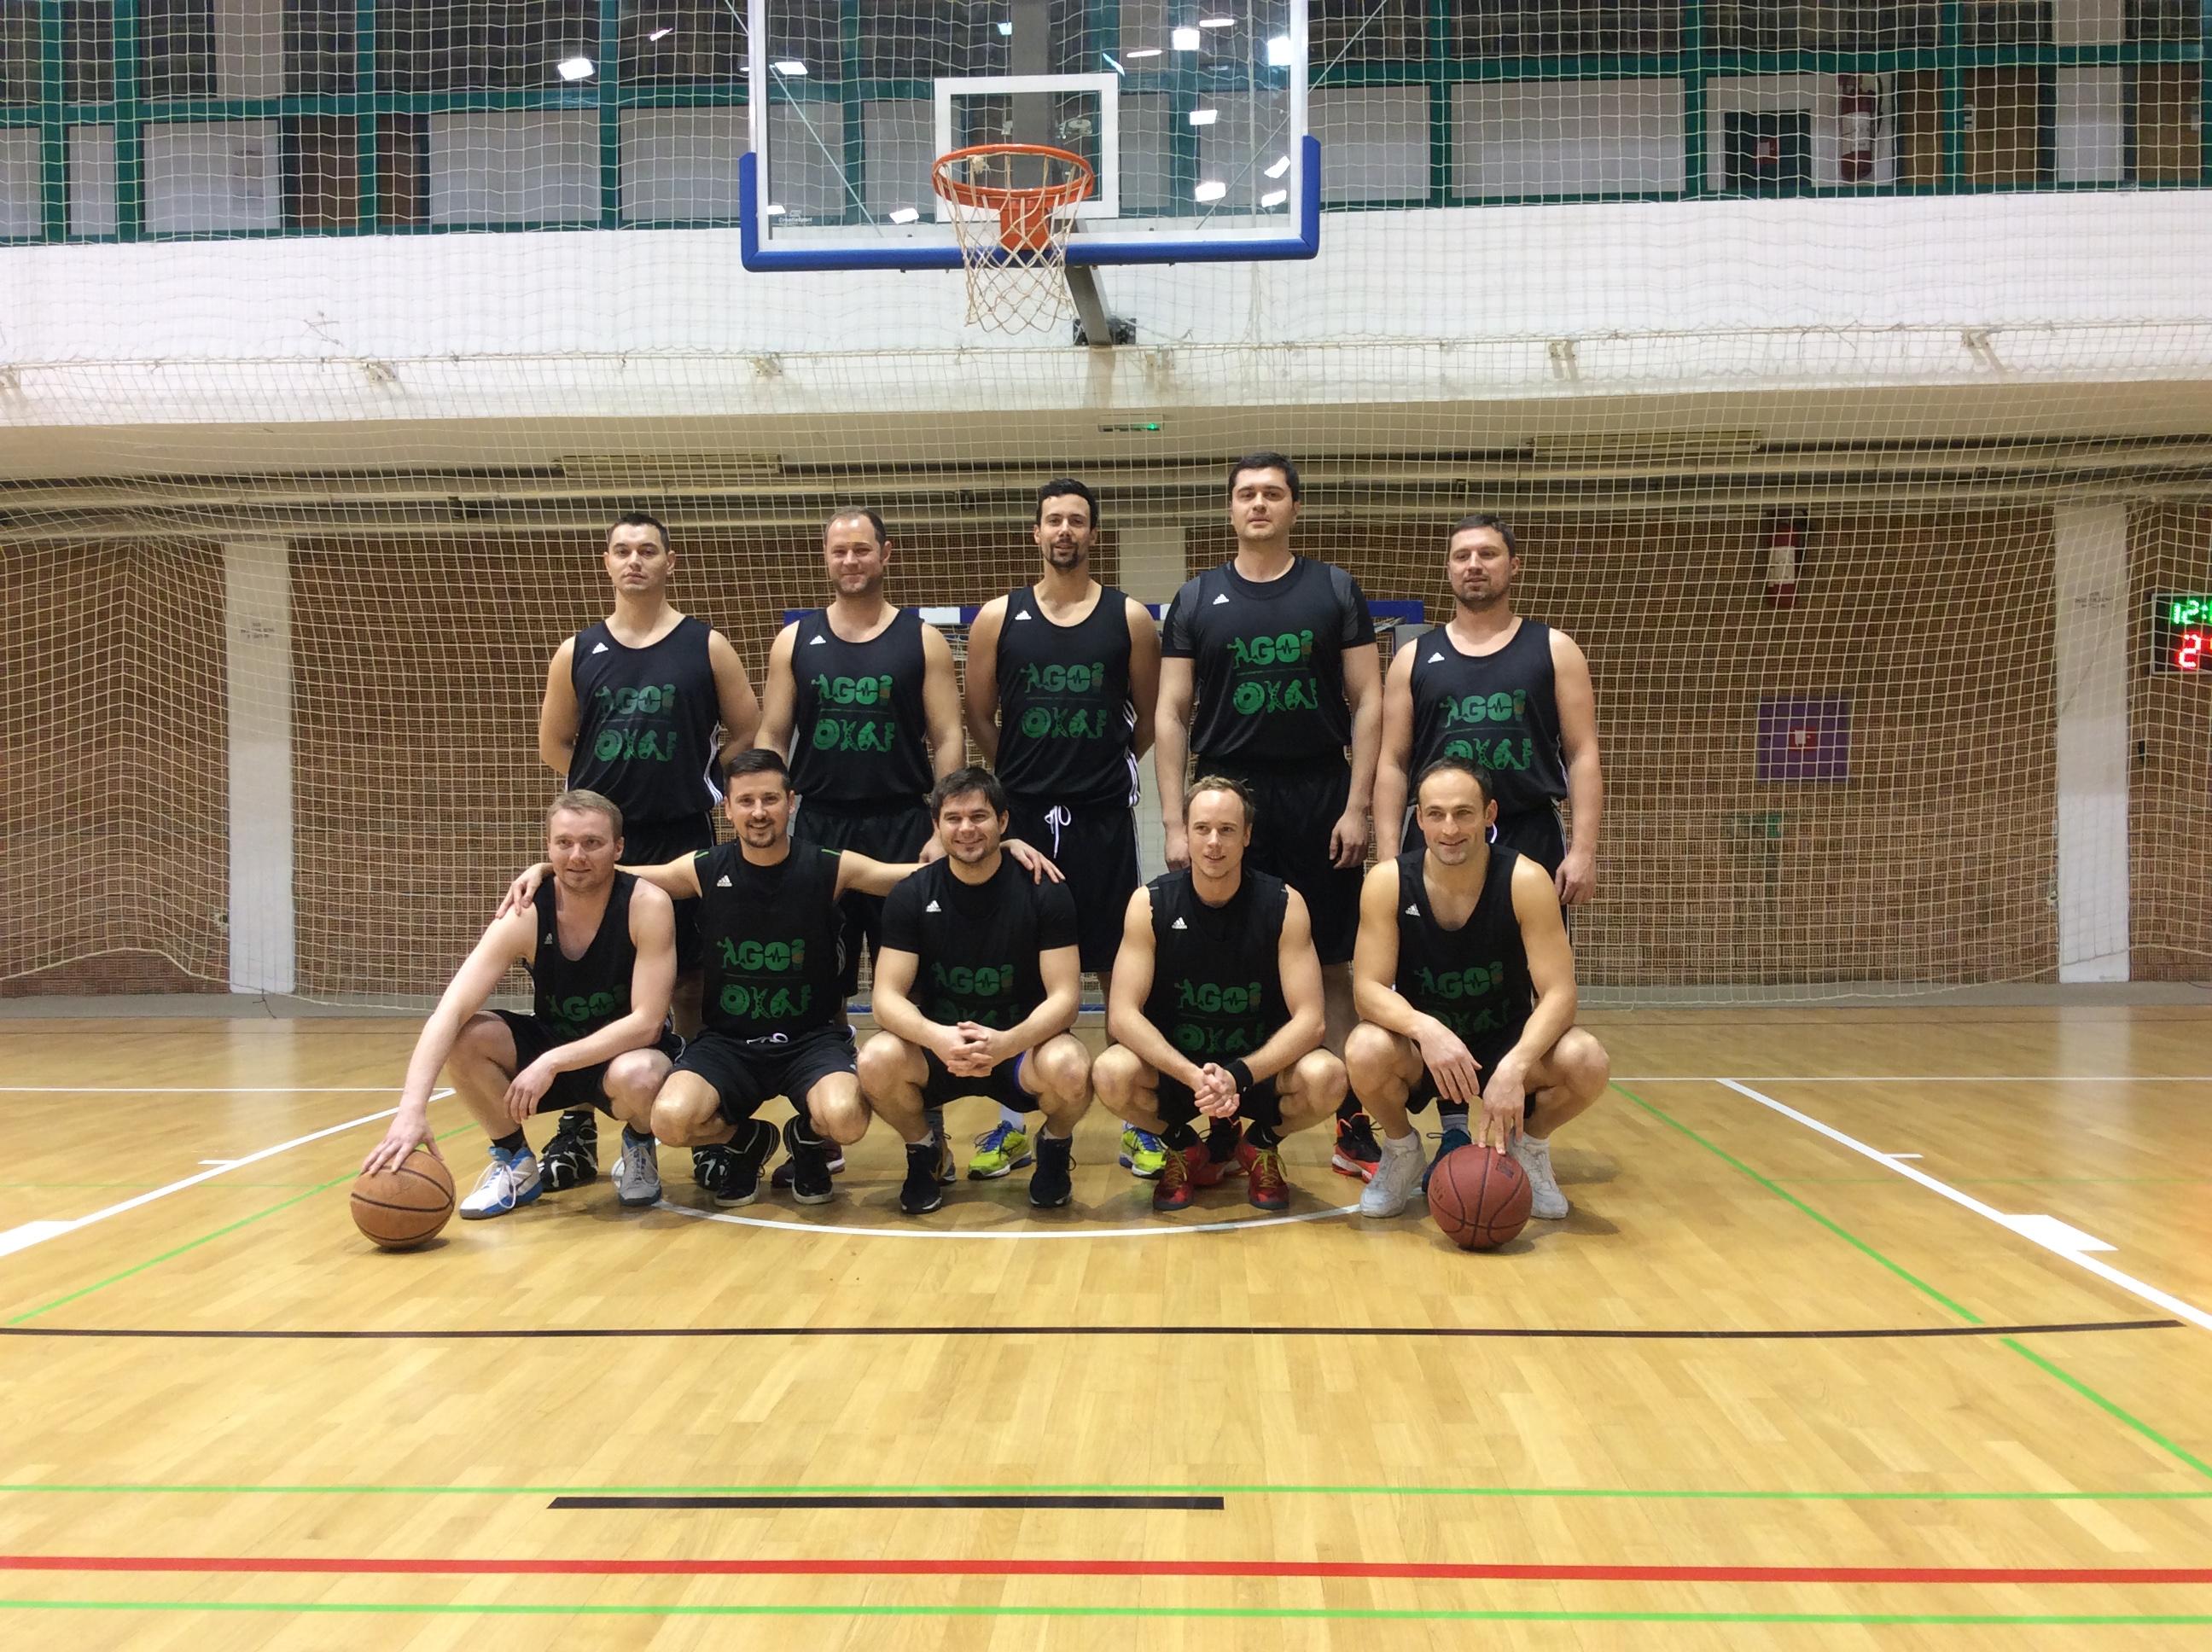 bjelovar-go2oka-new-team-uniforms-2016-1